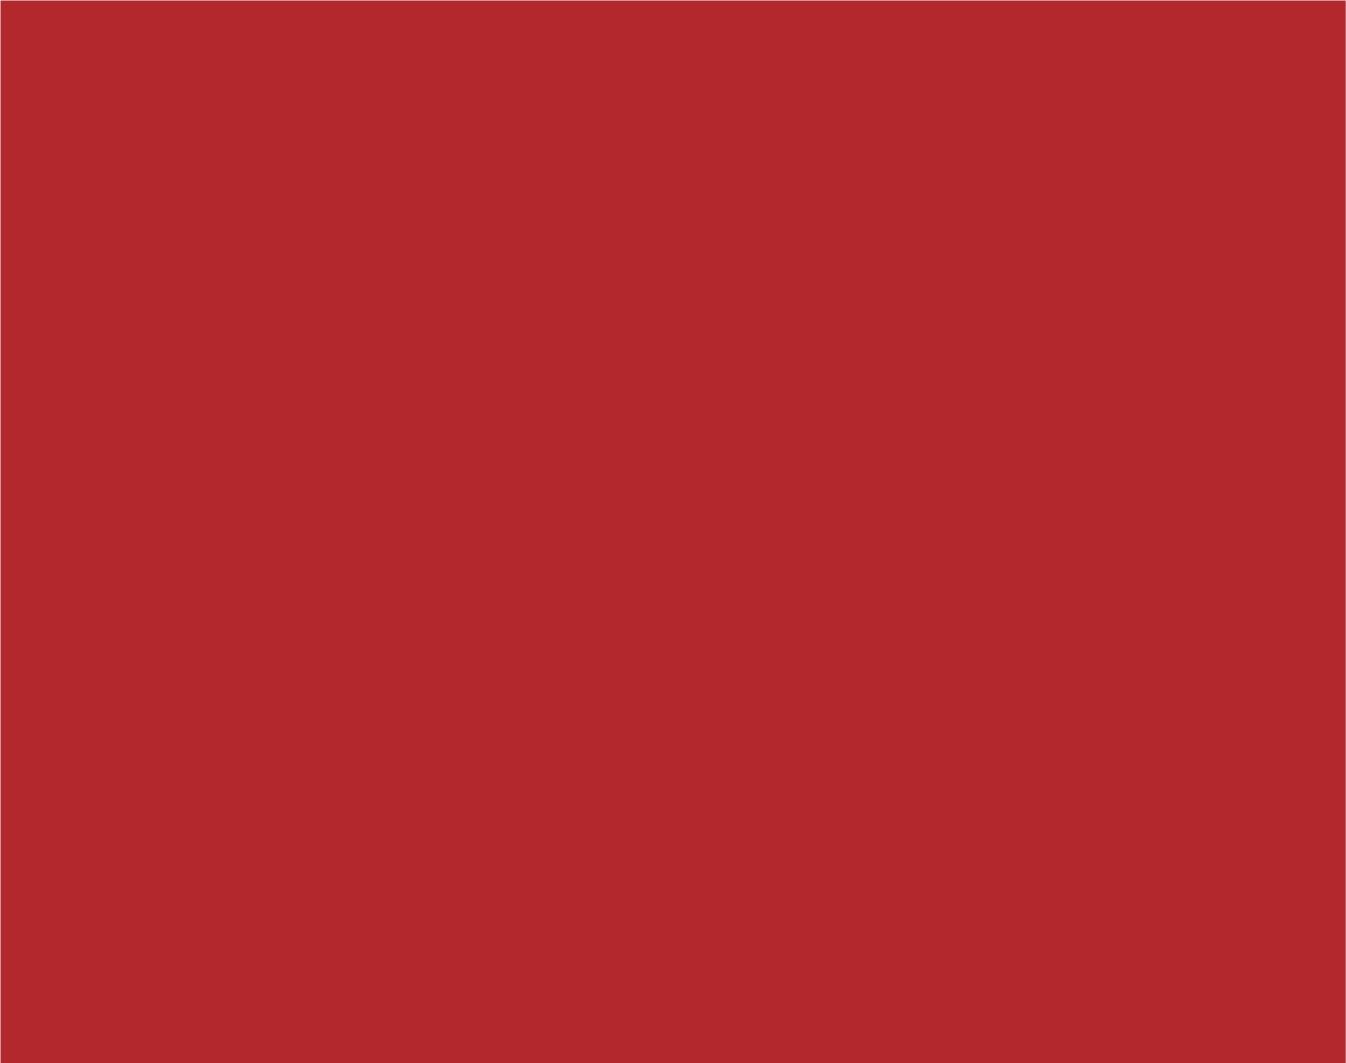 Pantone  1805 C  CMYK: 5 / 96 / 80 / 22  RGB: 175 / 39 / 47  Hex: #AF272F